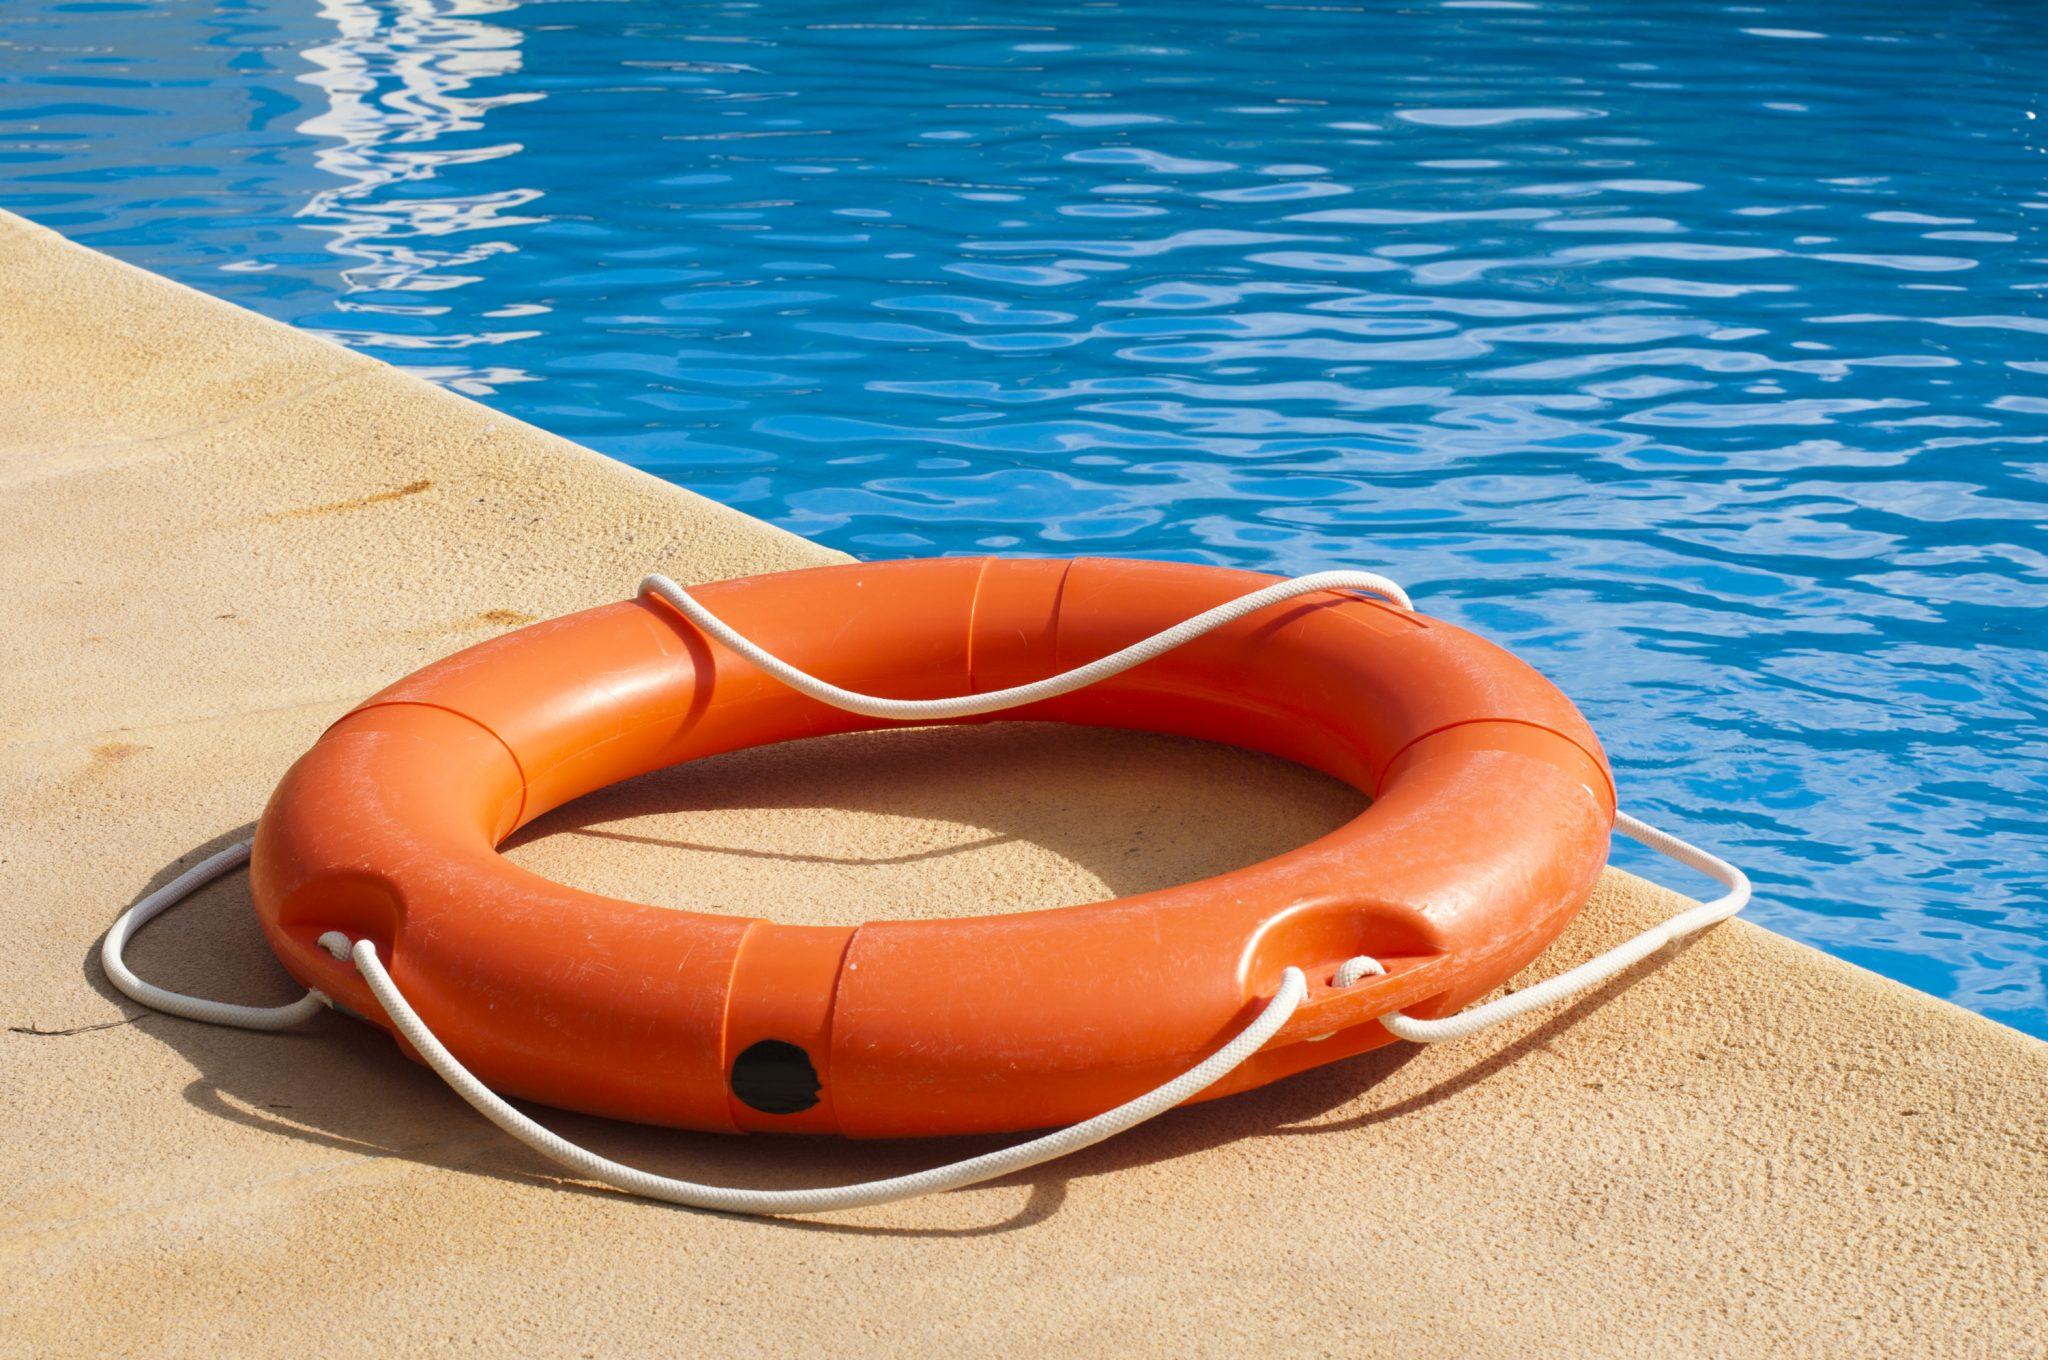 Flotador de emergencia en la piscina